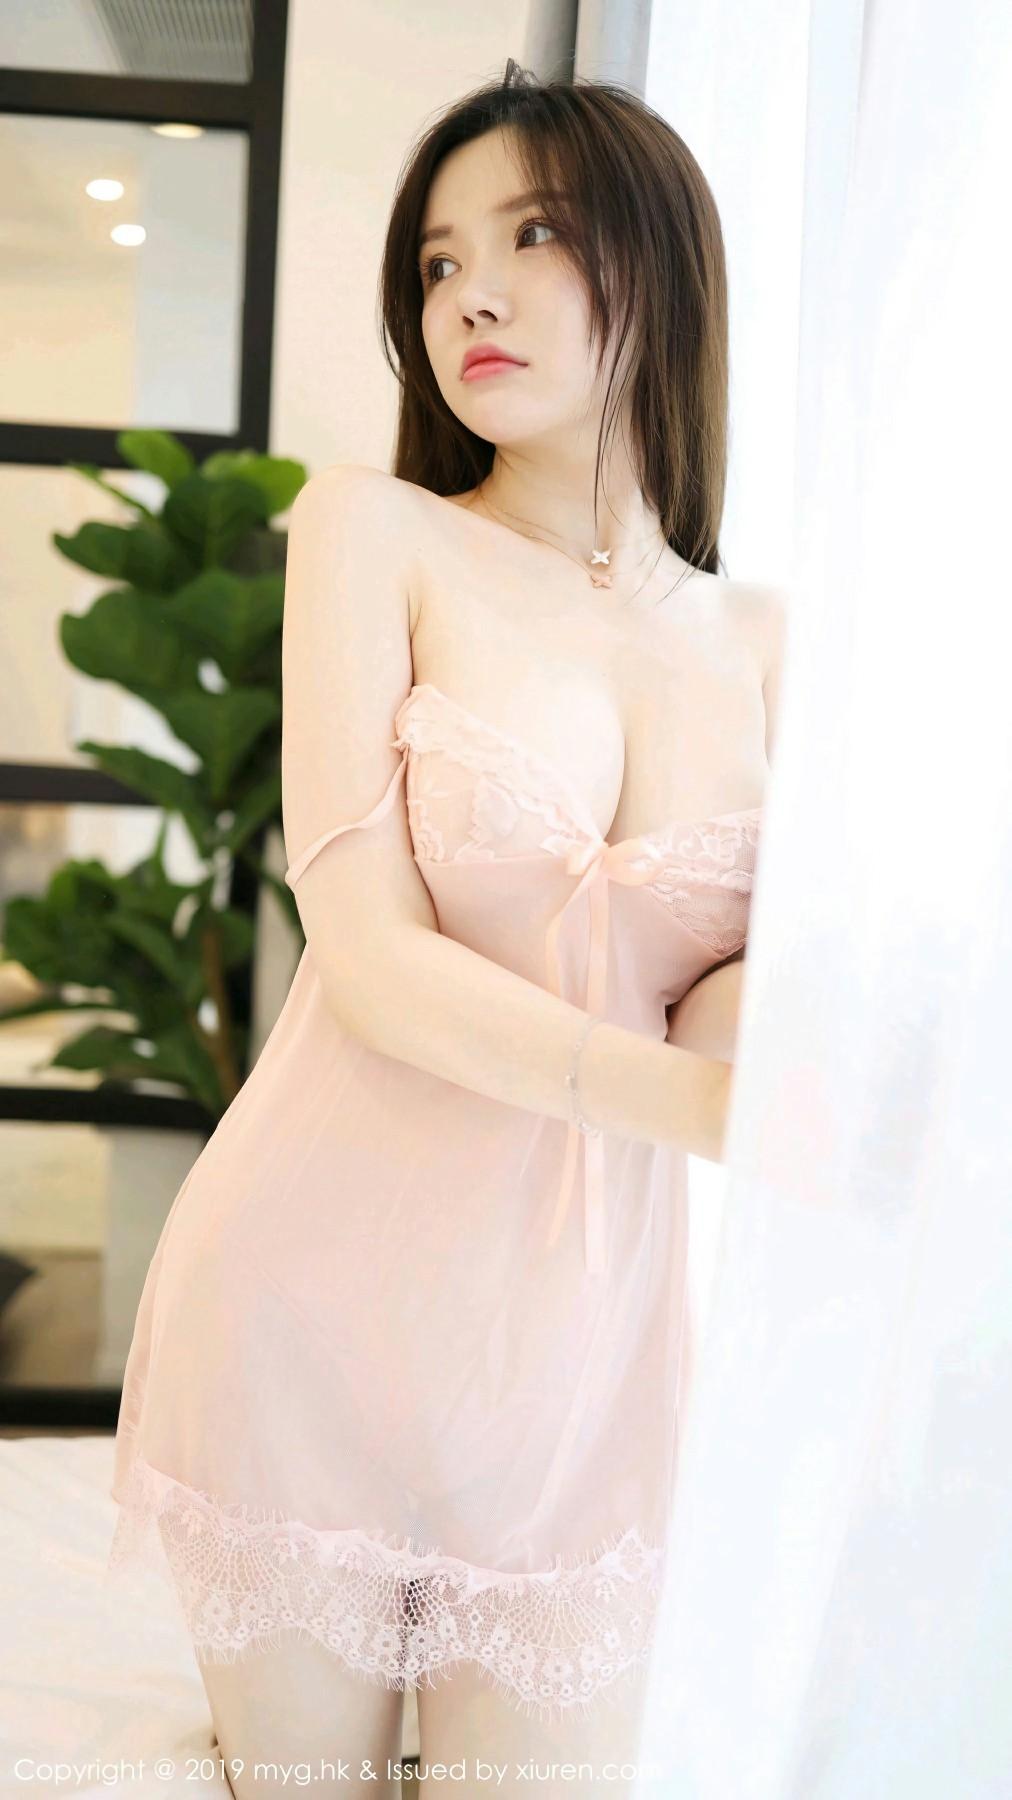 [MyGirl美媛馆]2019.08.07 VOL.378 糯美子Mini[60P] 美媛馆 第1张